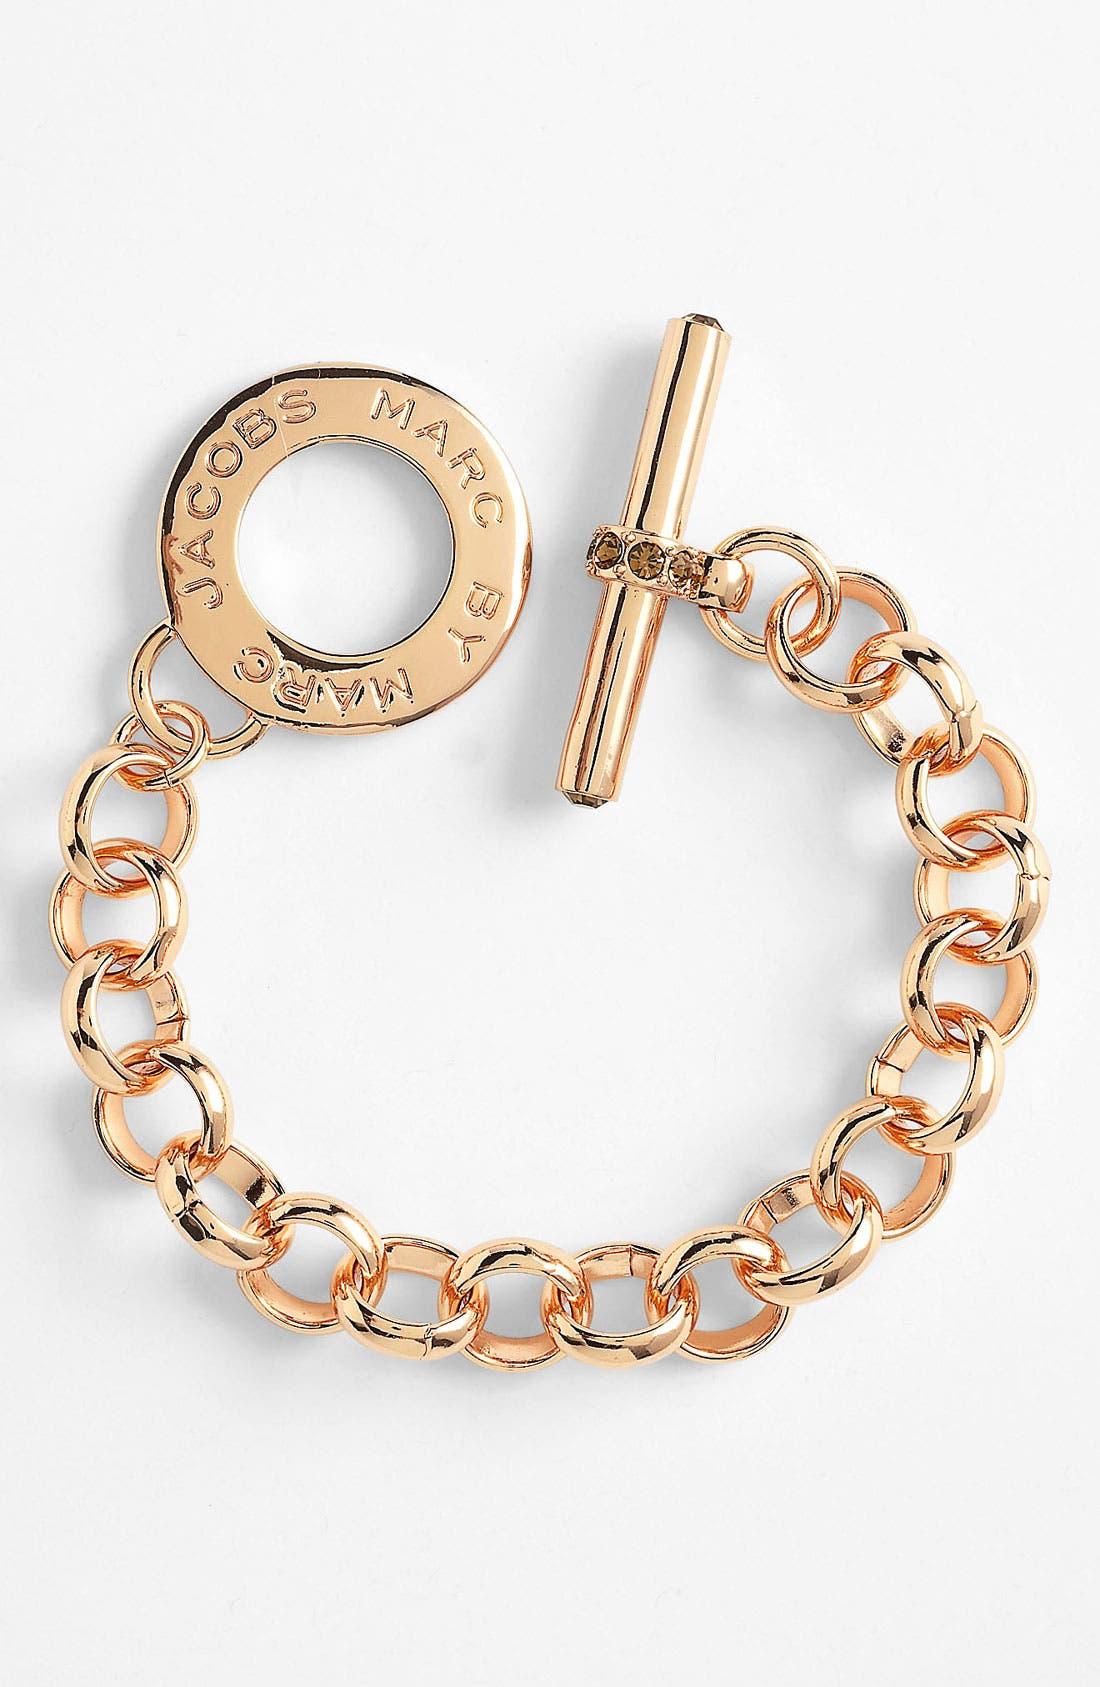 Alternate Image 1 Selected - MARC BY MARC JACOBS 'Toggles & Turnlocks' Link Bracelet